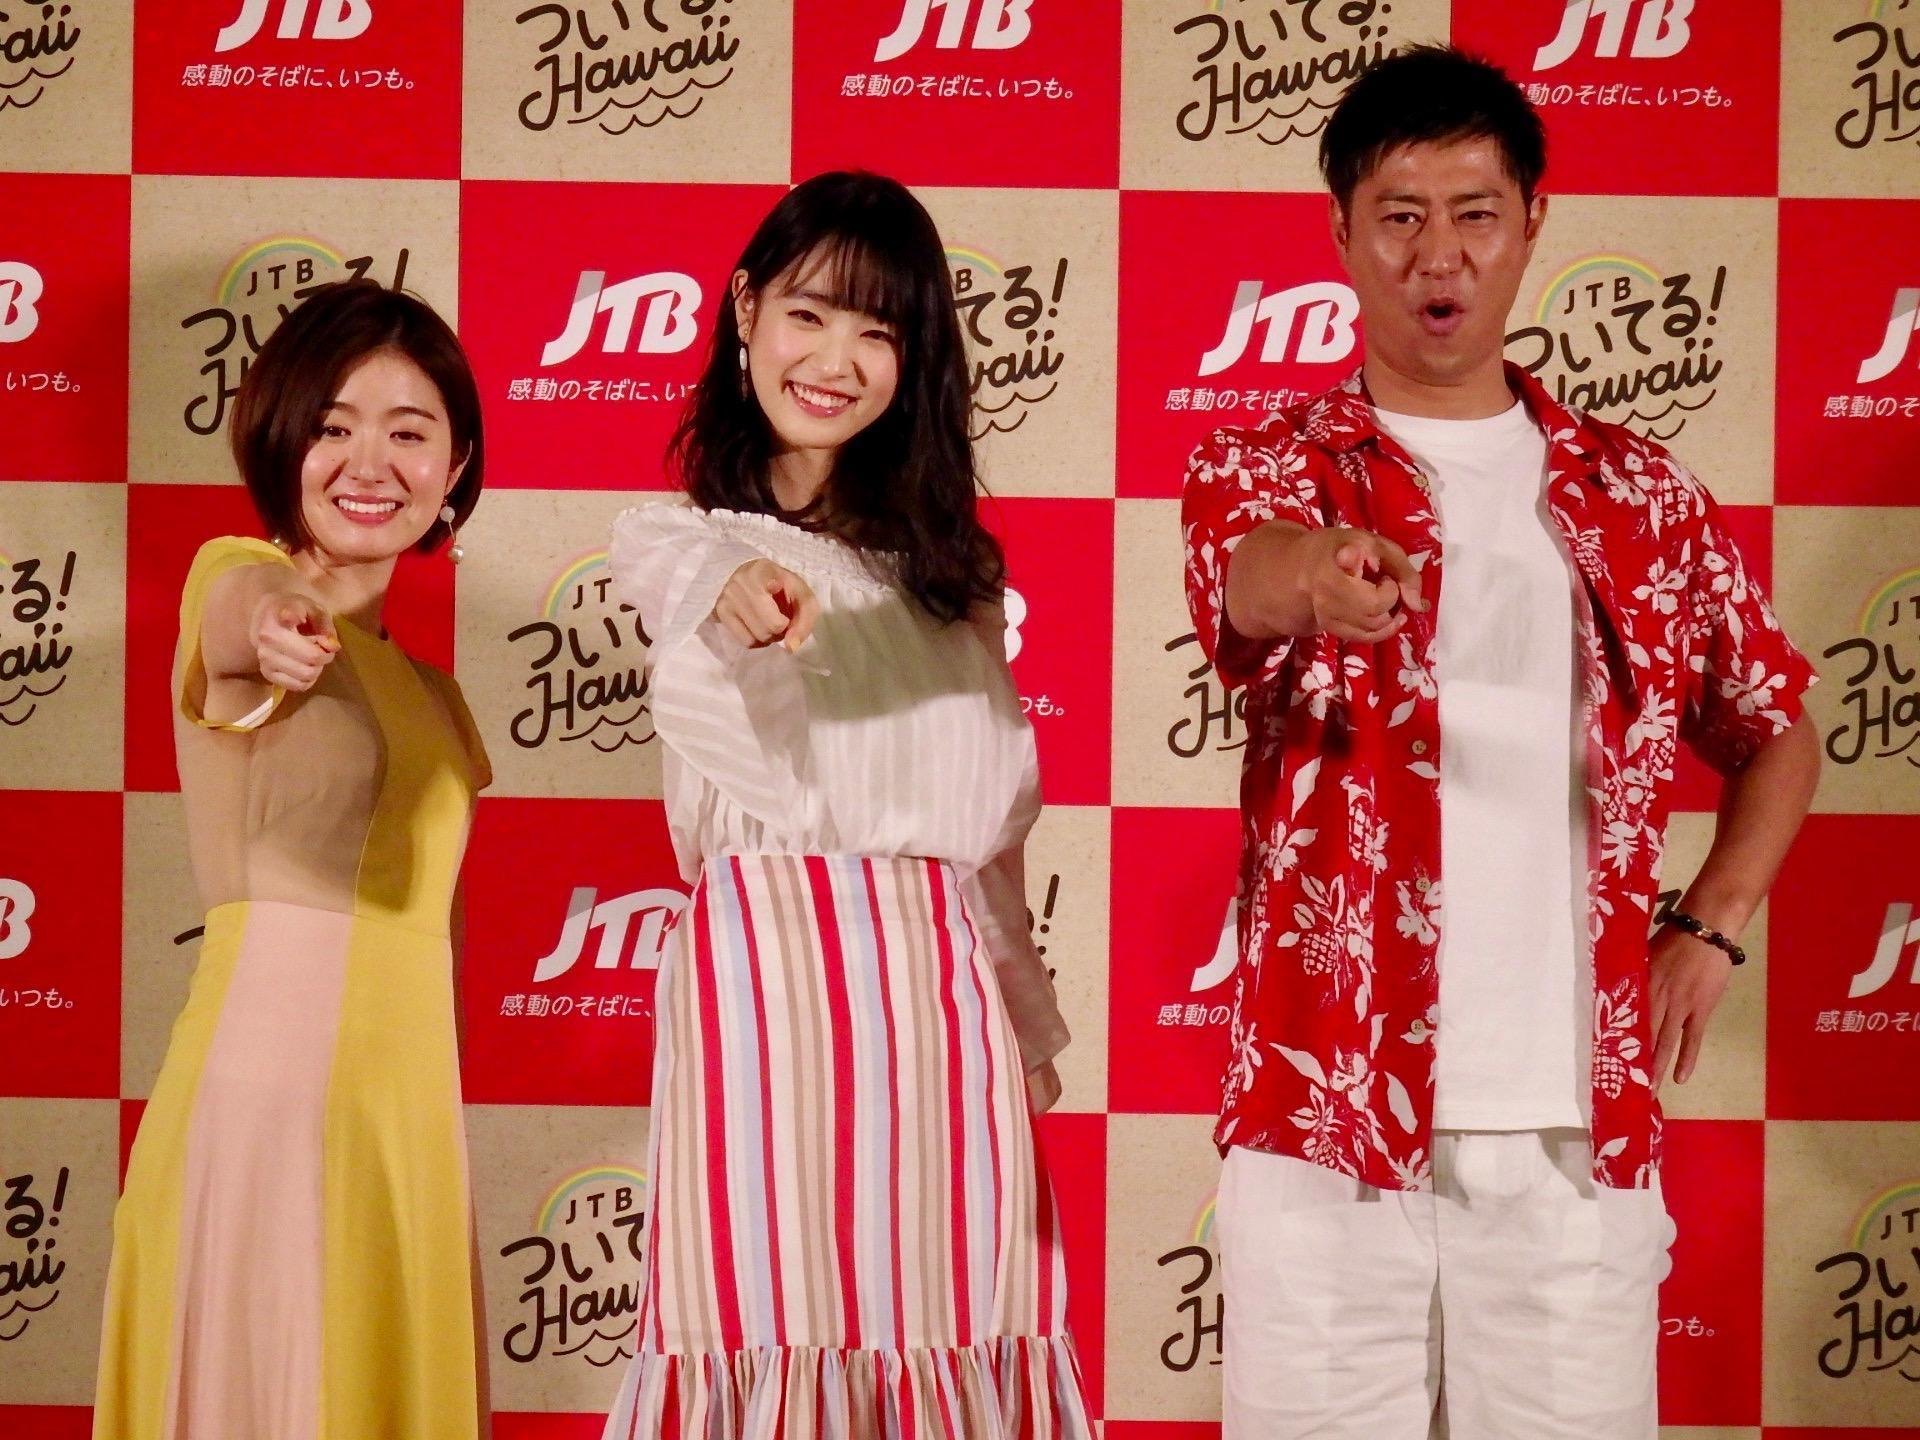 http://news.yoshimoto.co.jp/20190122223527-7536cbfc6bb98a9659faed441ae1672c52016917.jpeg